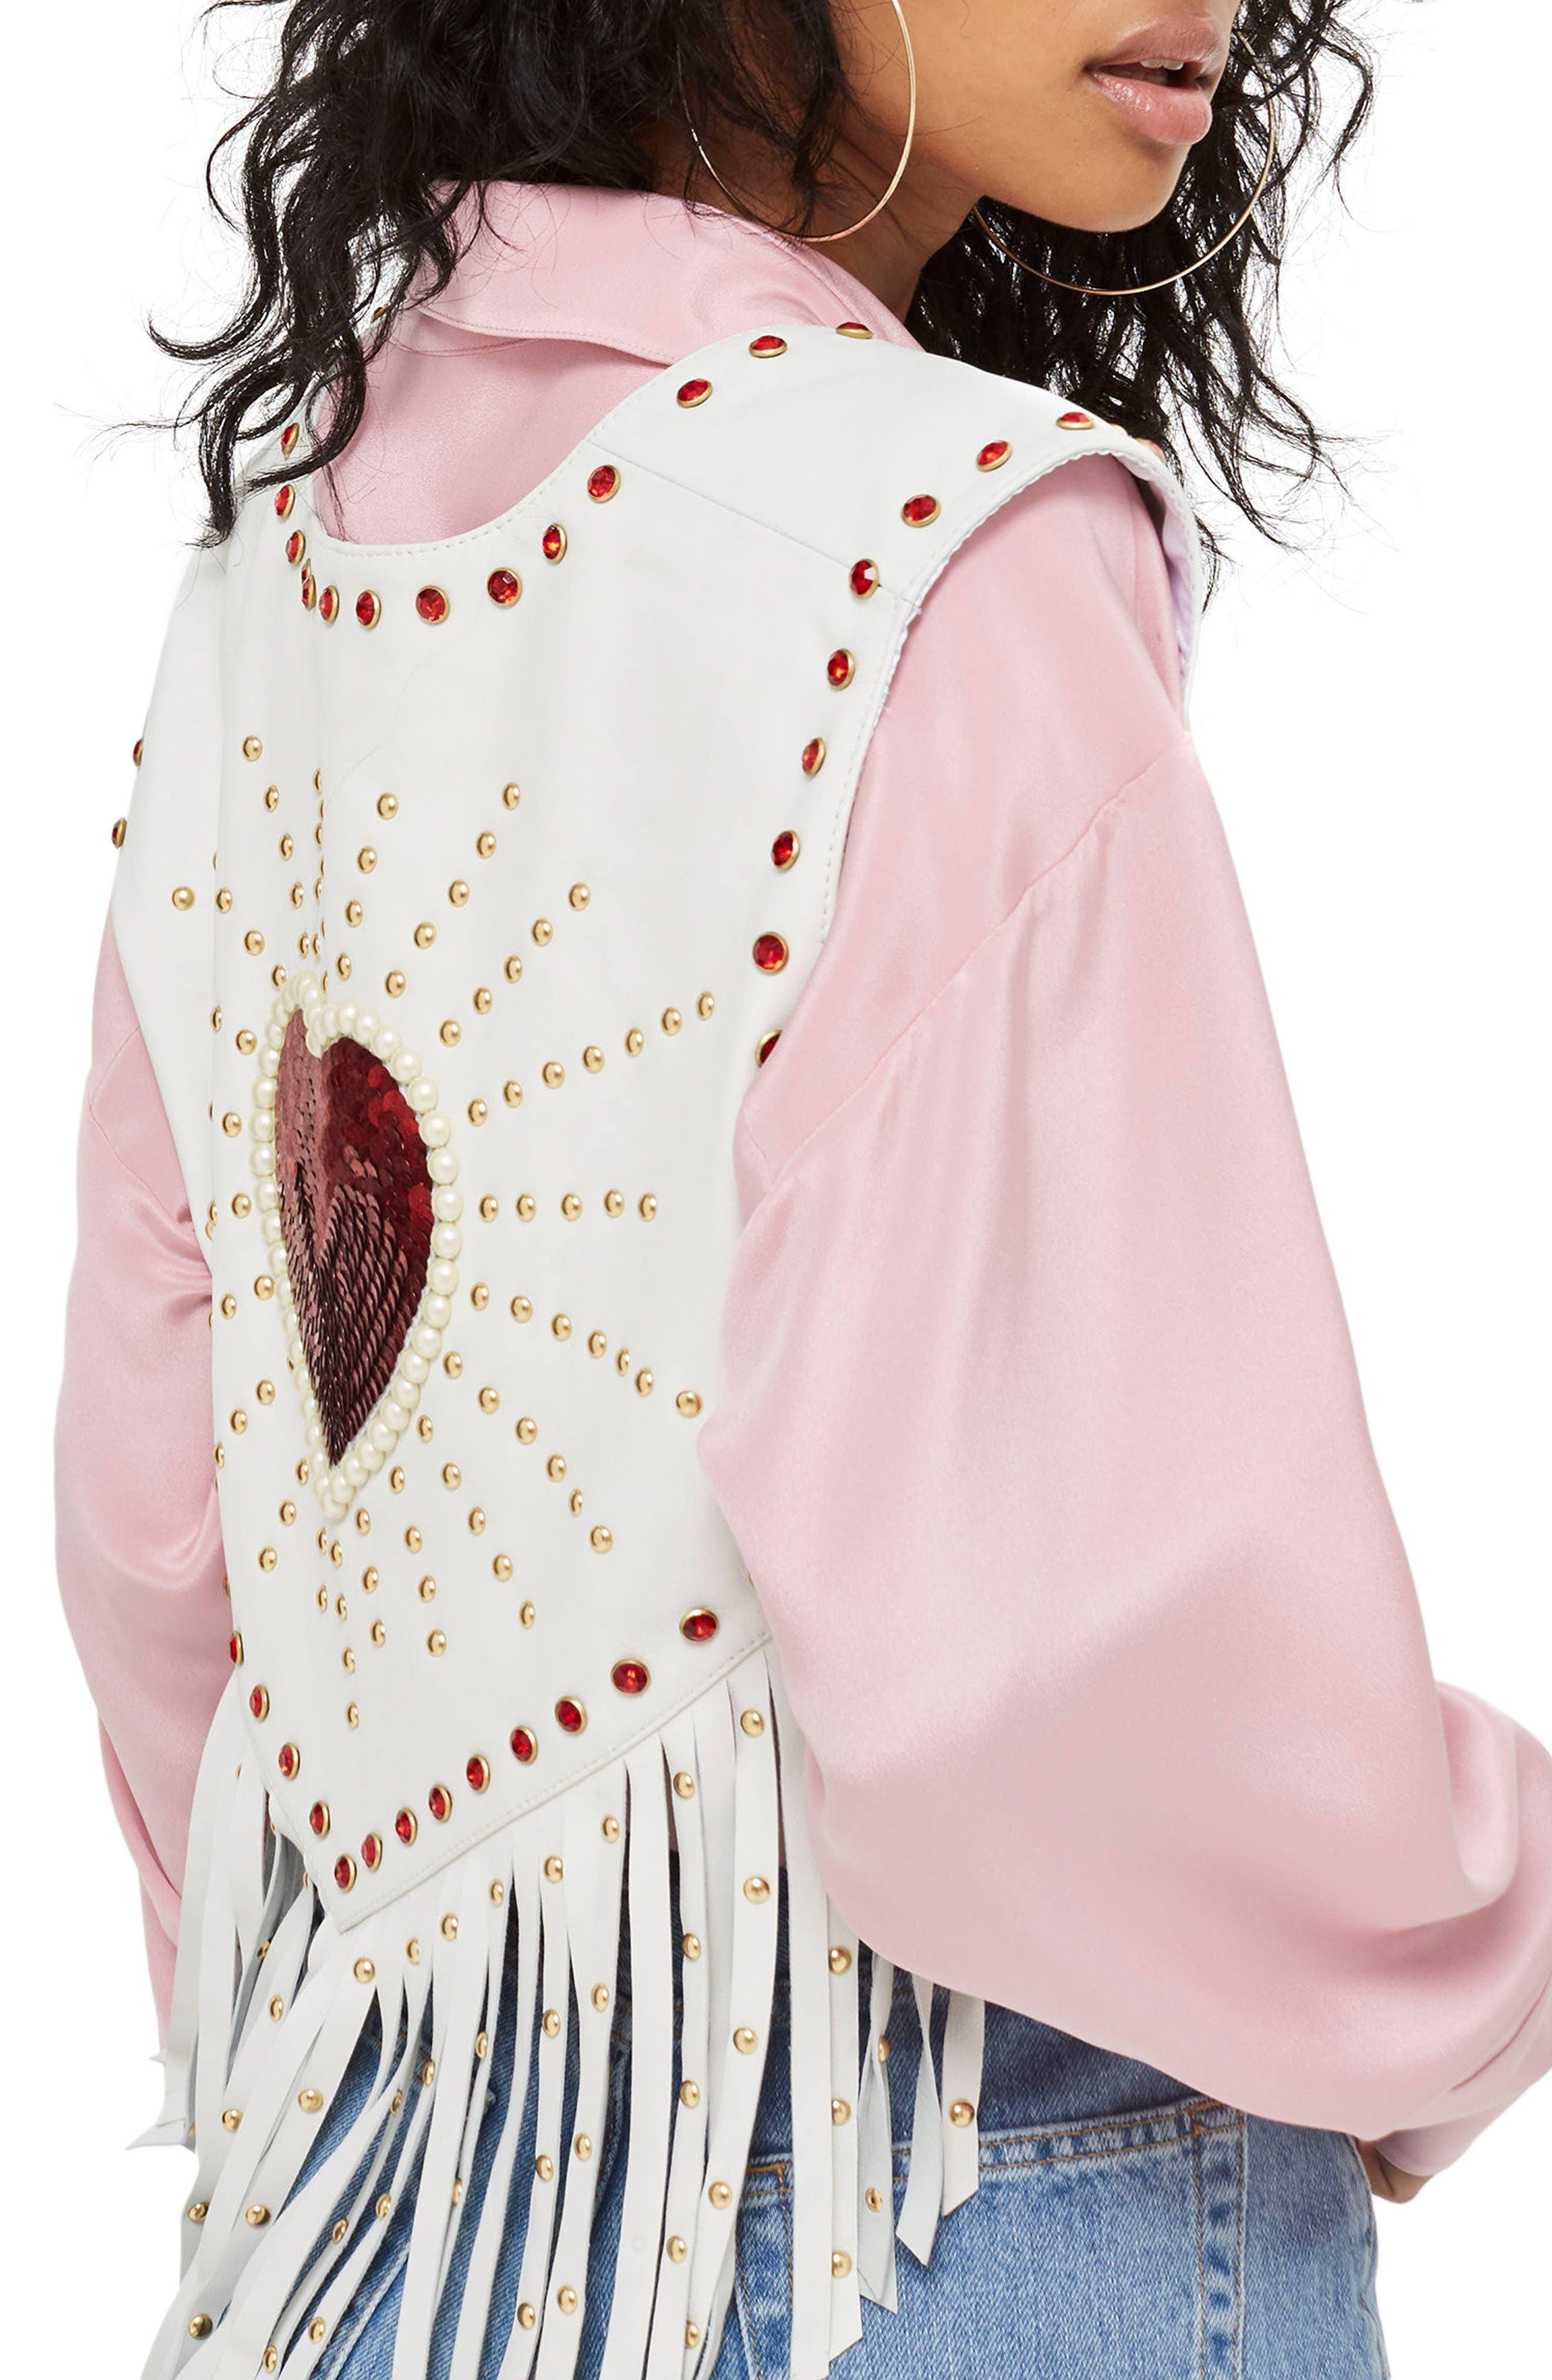 Sacred Heart Festival Leather Waistcoat,                             Alternate thumbnail 3, color,                             White Multi